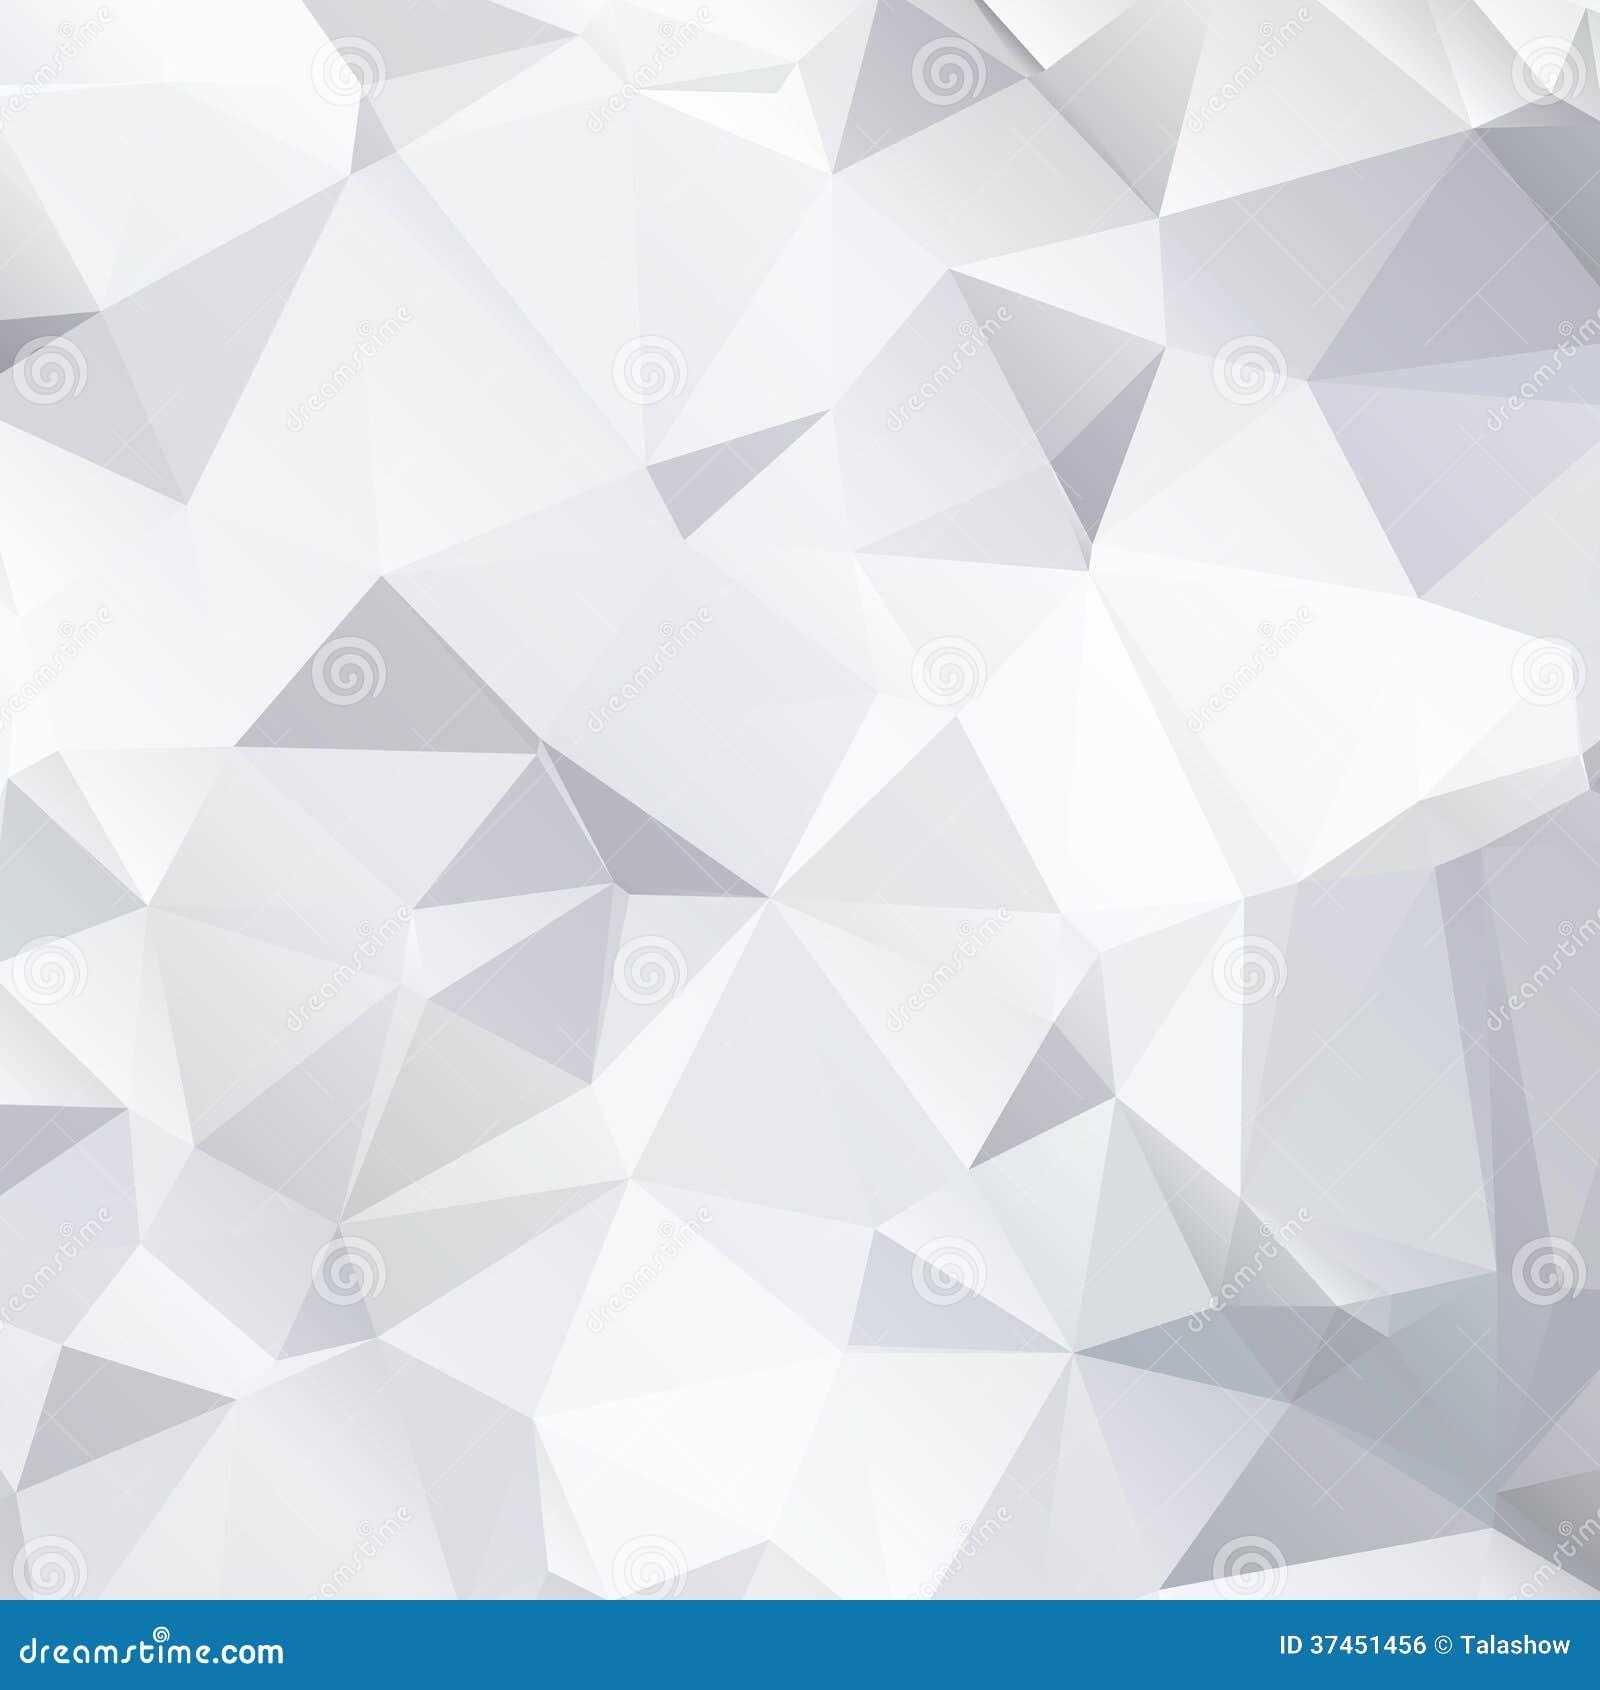 Белый квадратный фон